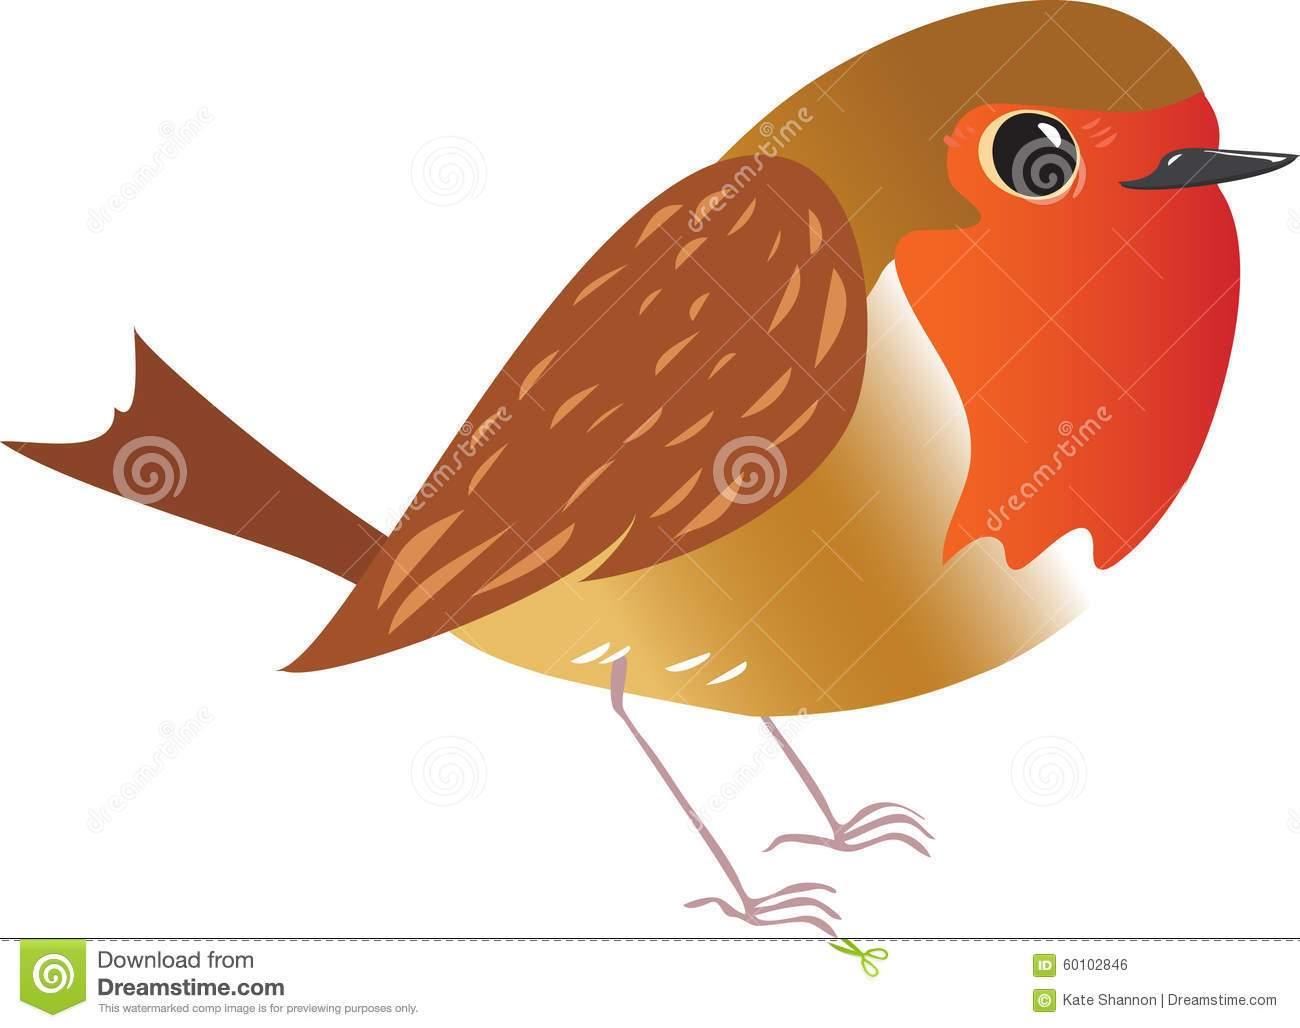 Robin red breast clipart 6 » Clipart Portal.